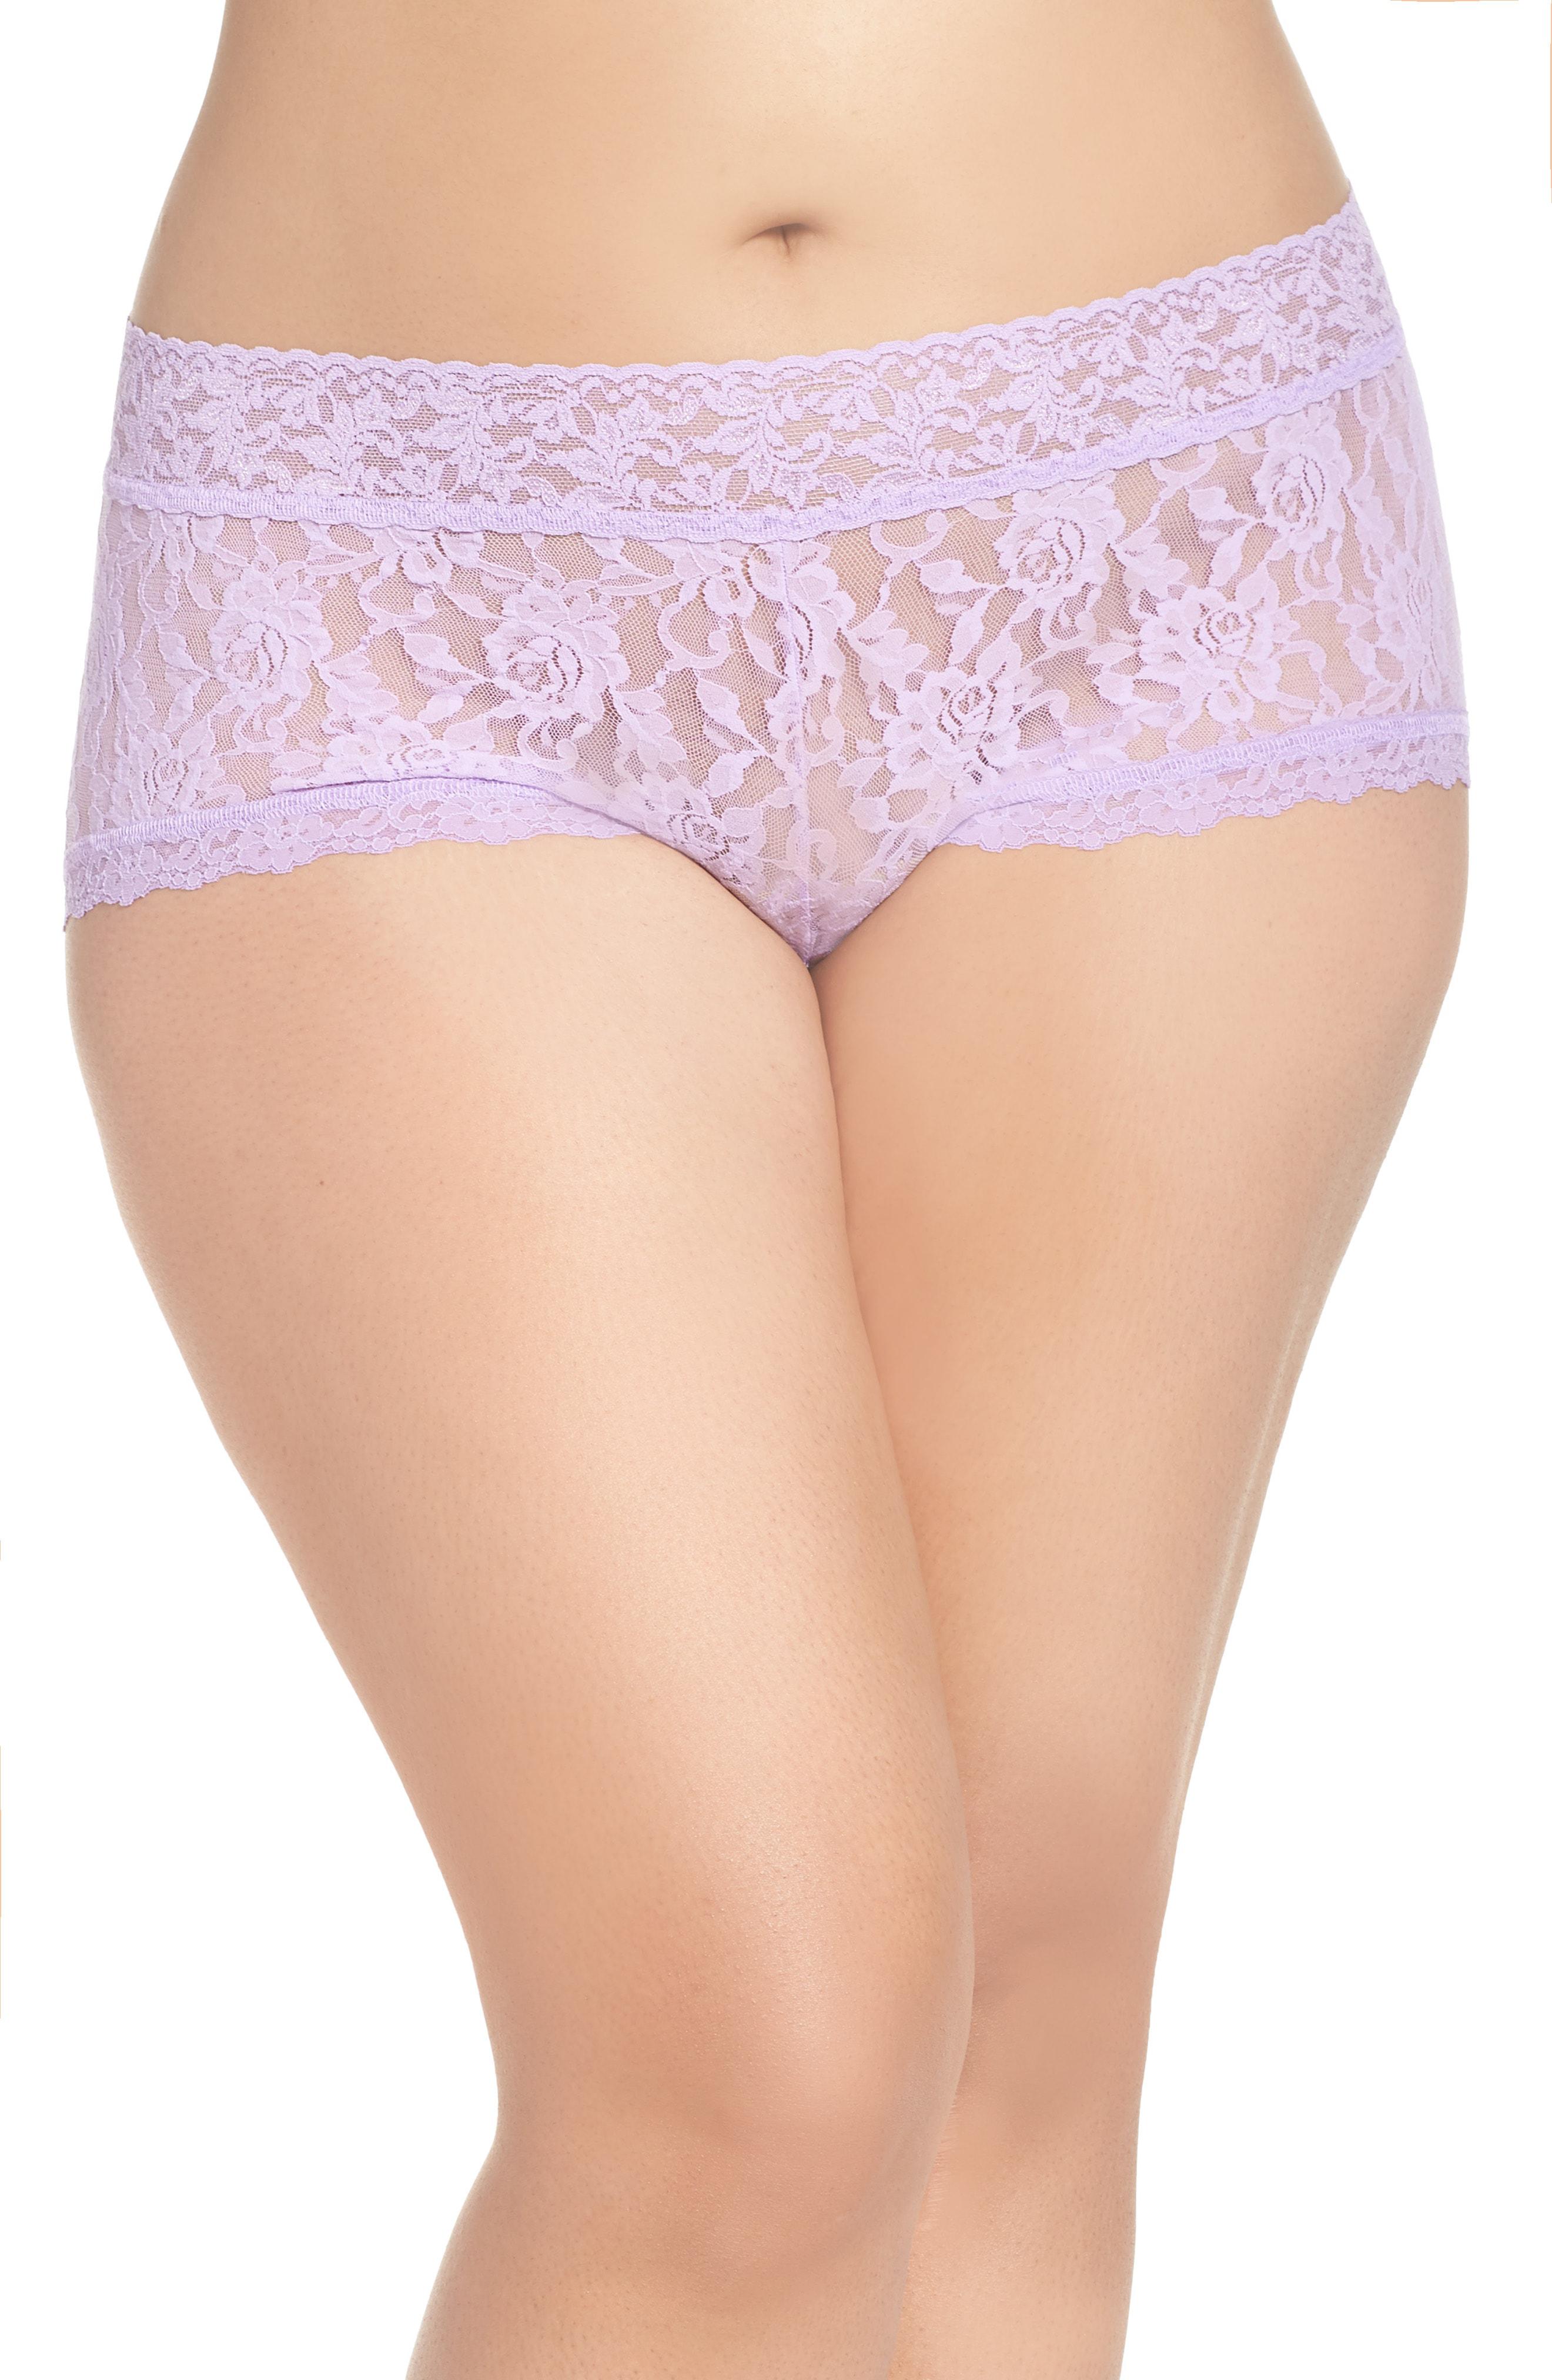 b340eb002 Hanky Panky Stretch Lace Boyshorts In Lavender